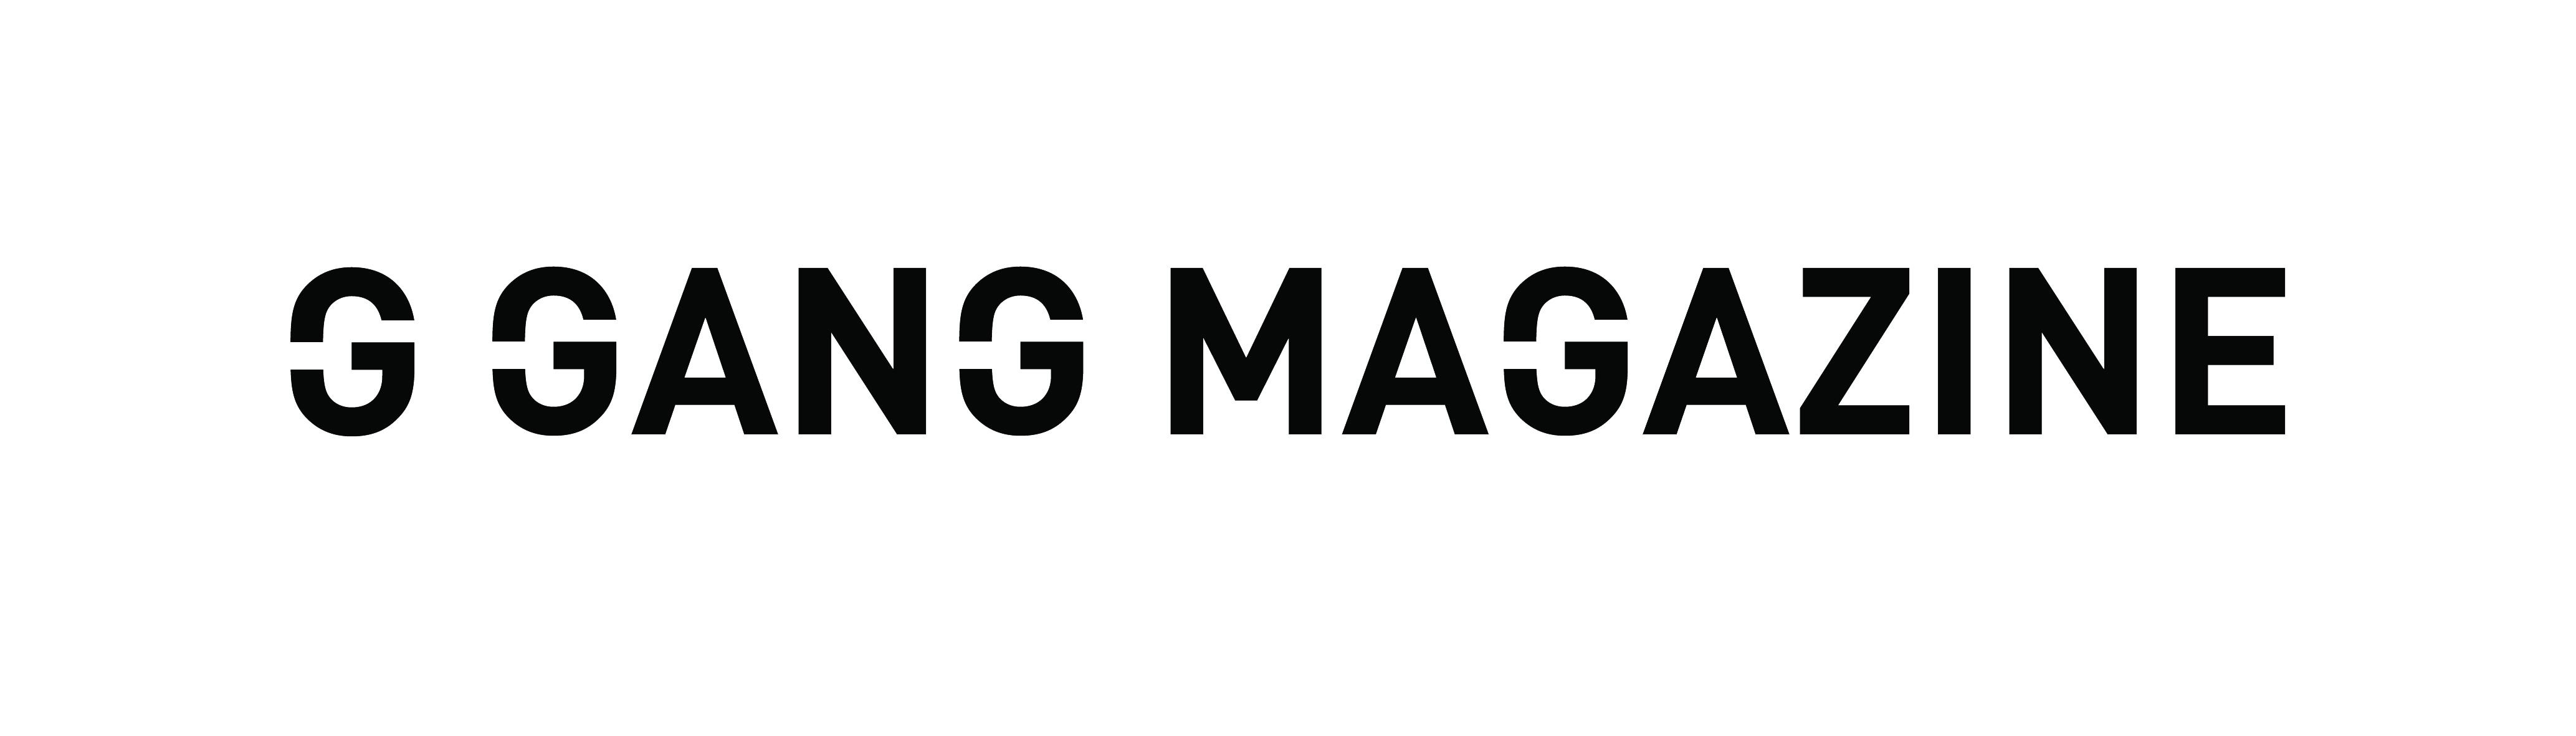 GGang Magazine